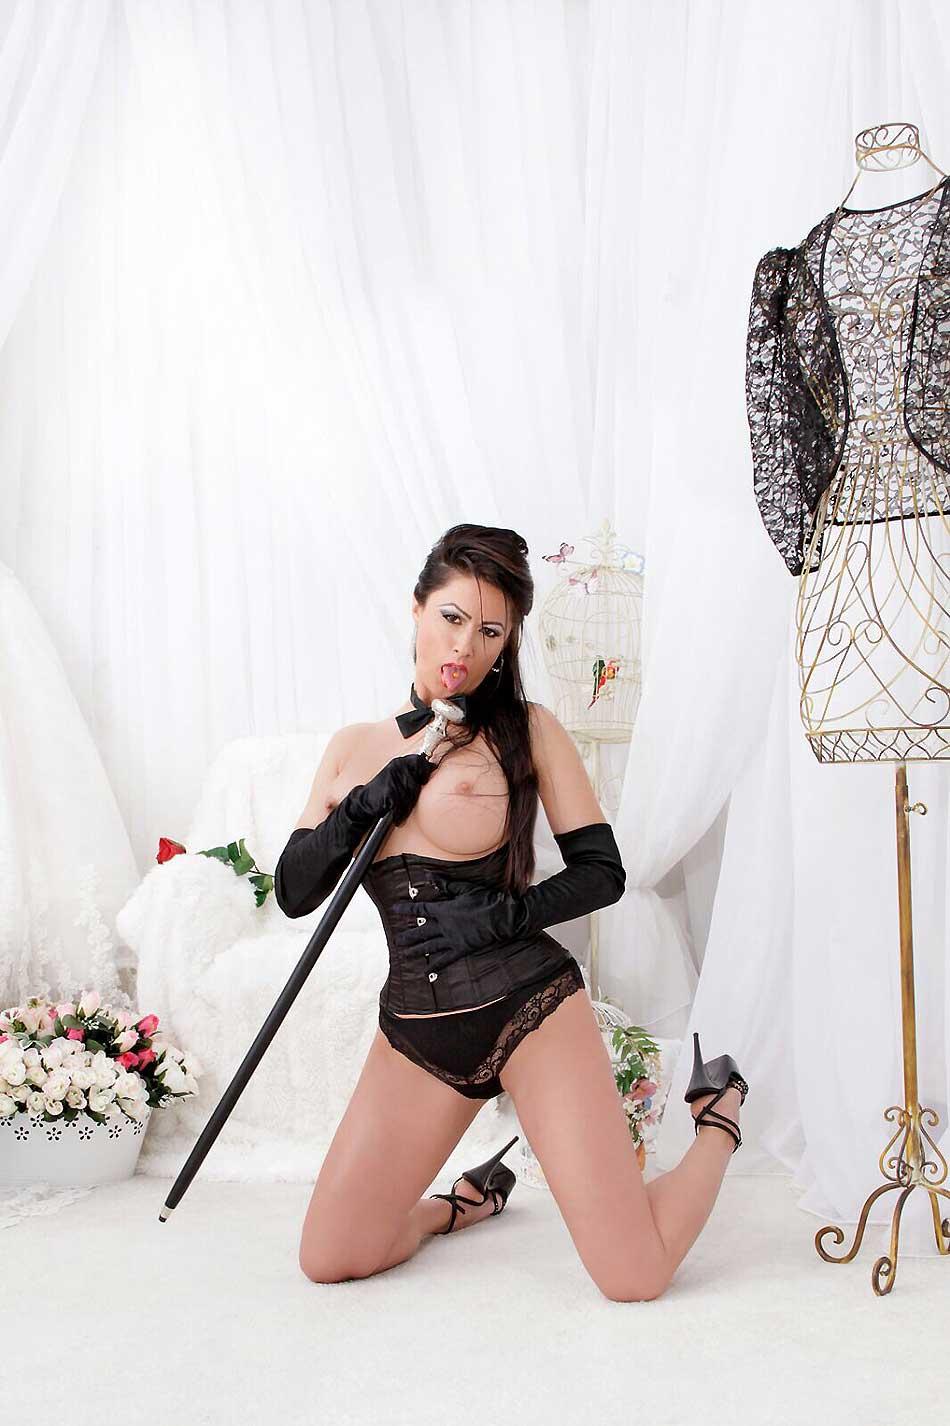 swingerclub in salzburg erotische massage kempten